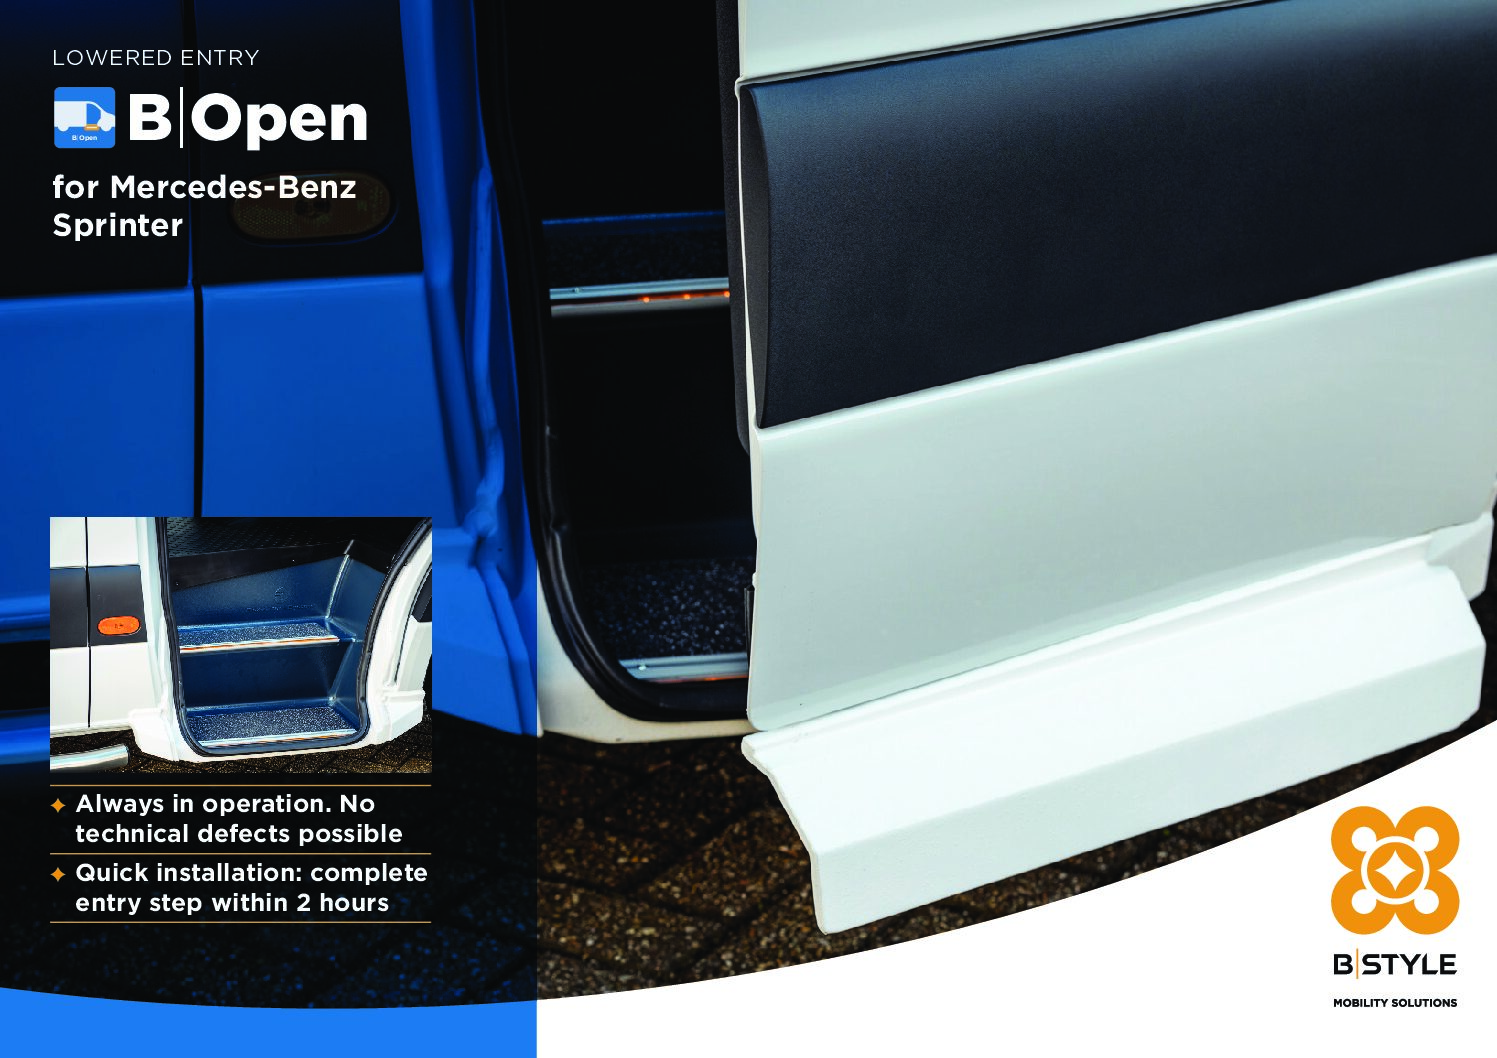 B-Style – B-Open Mercedes-Benz Sprinter